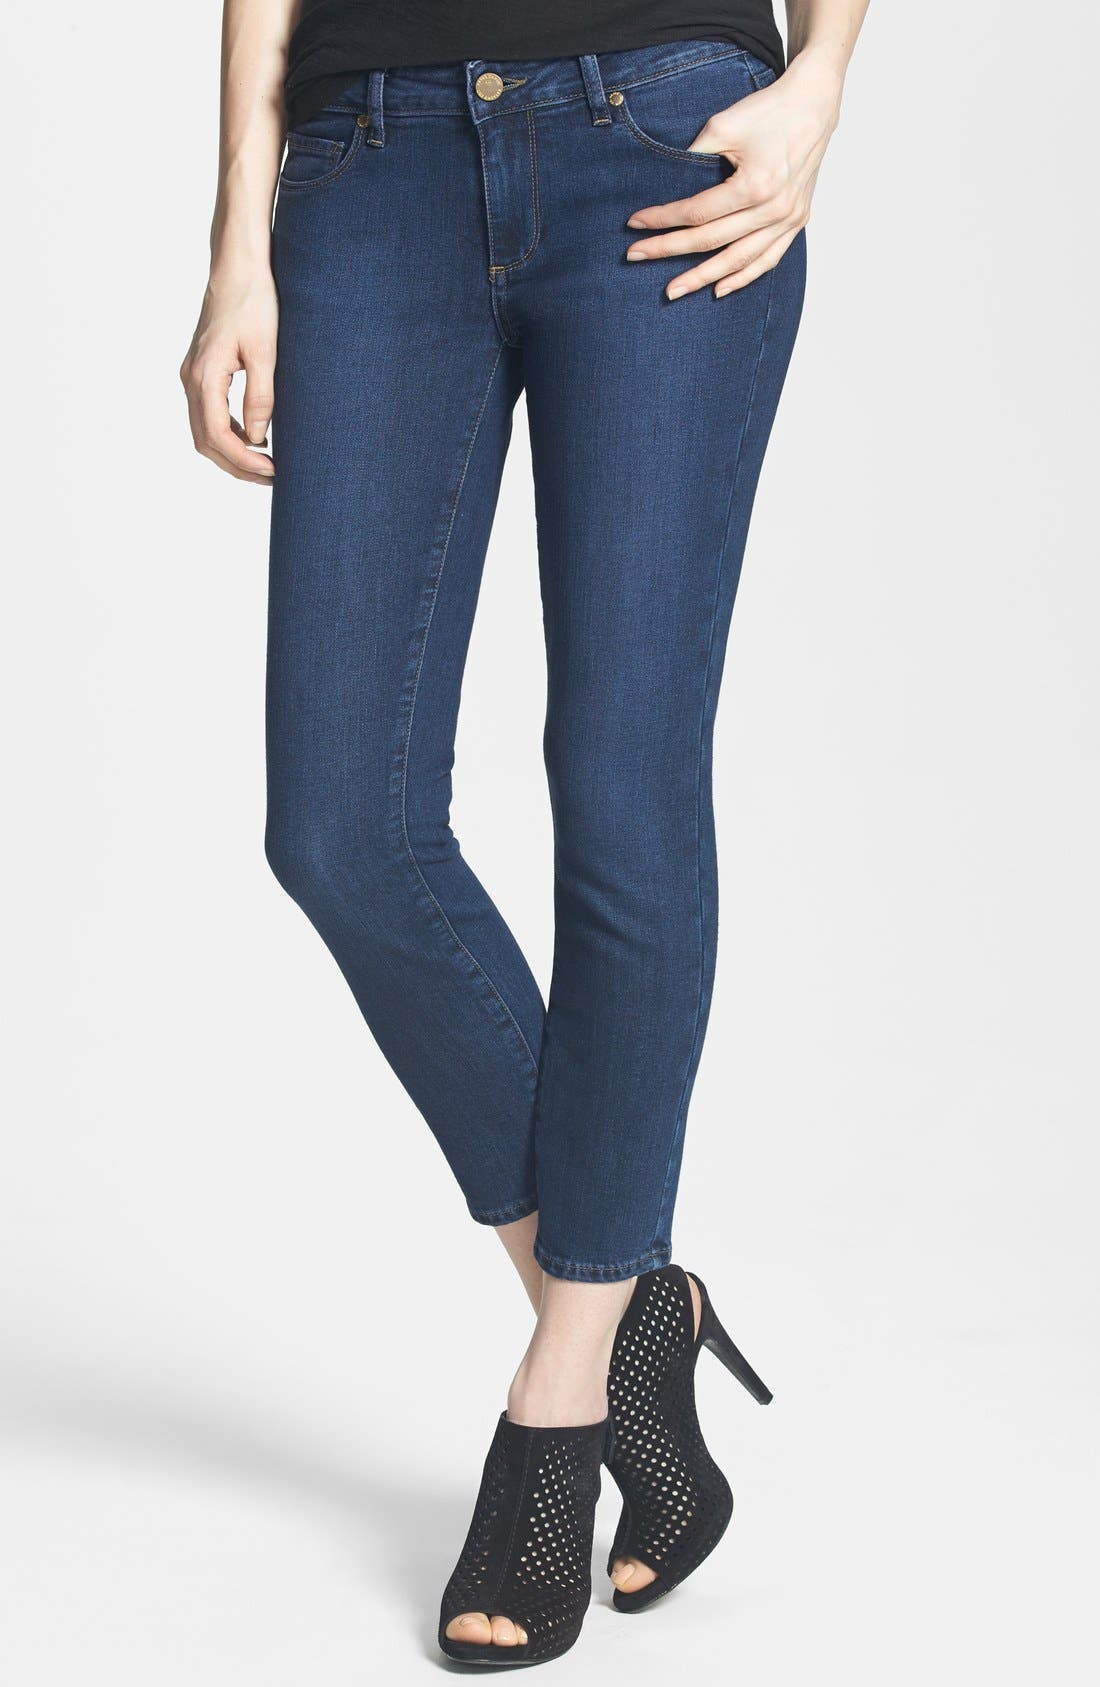 Main Image - Paige Denim 'Kylie' Crop Skinny Jeans (Claire)